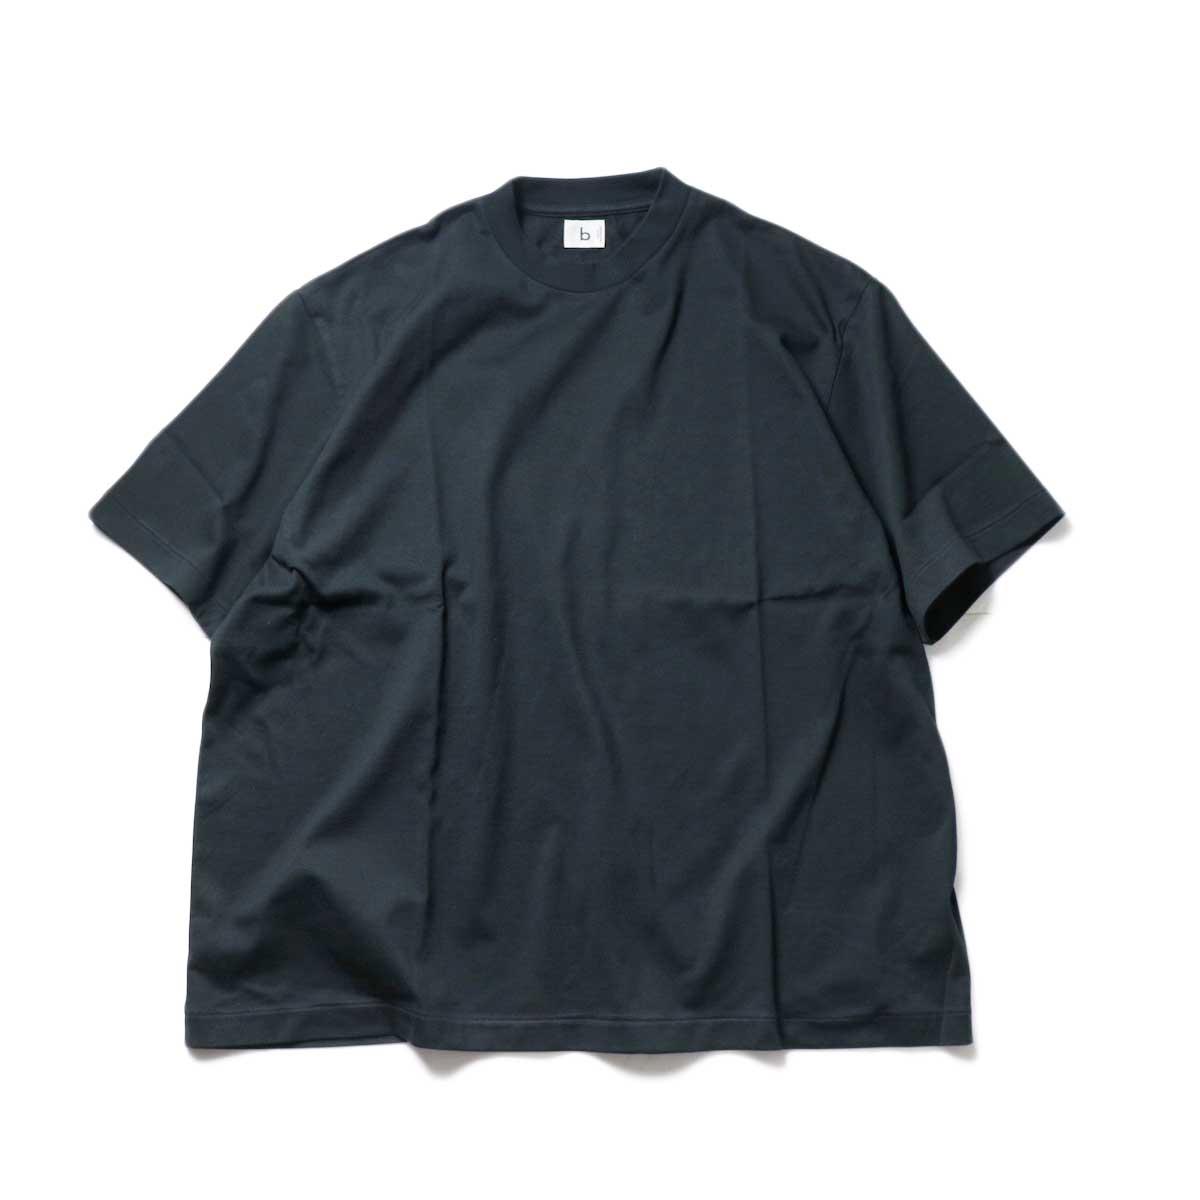 blurhms ROOTSTOCK / Extra Soft Tee BIG S/S (Black)